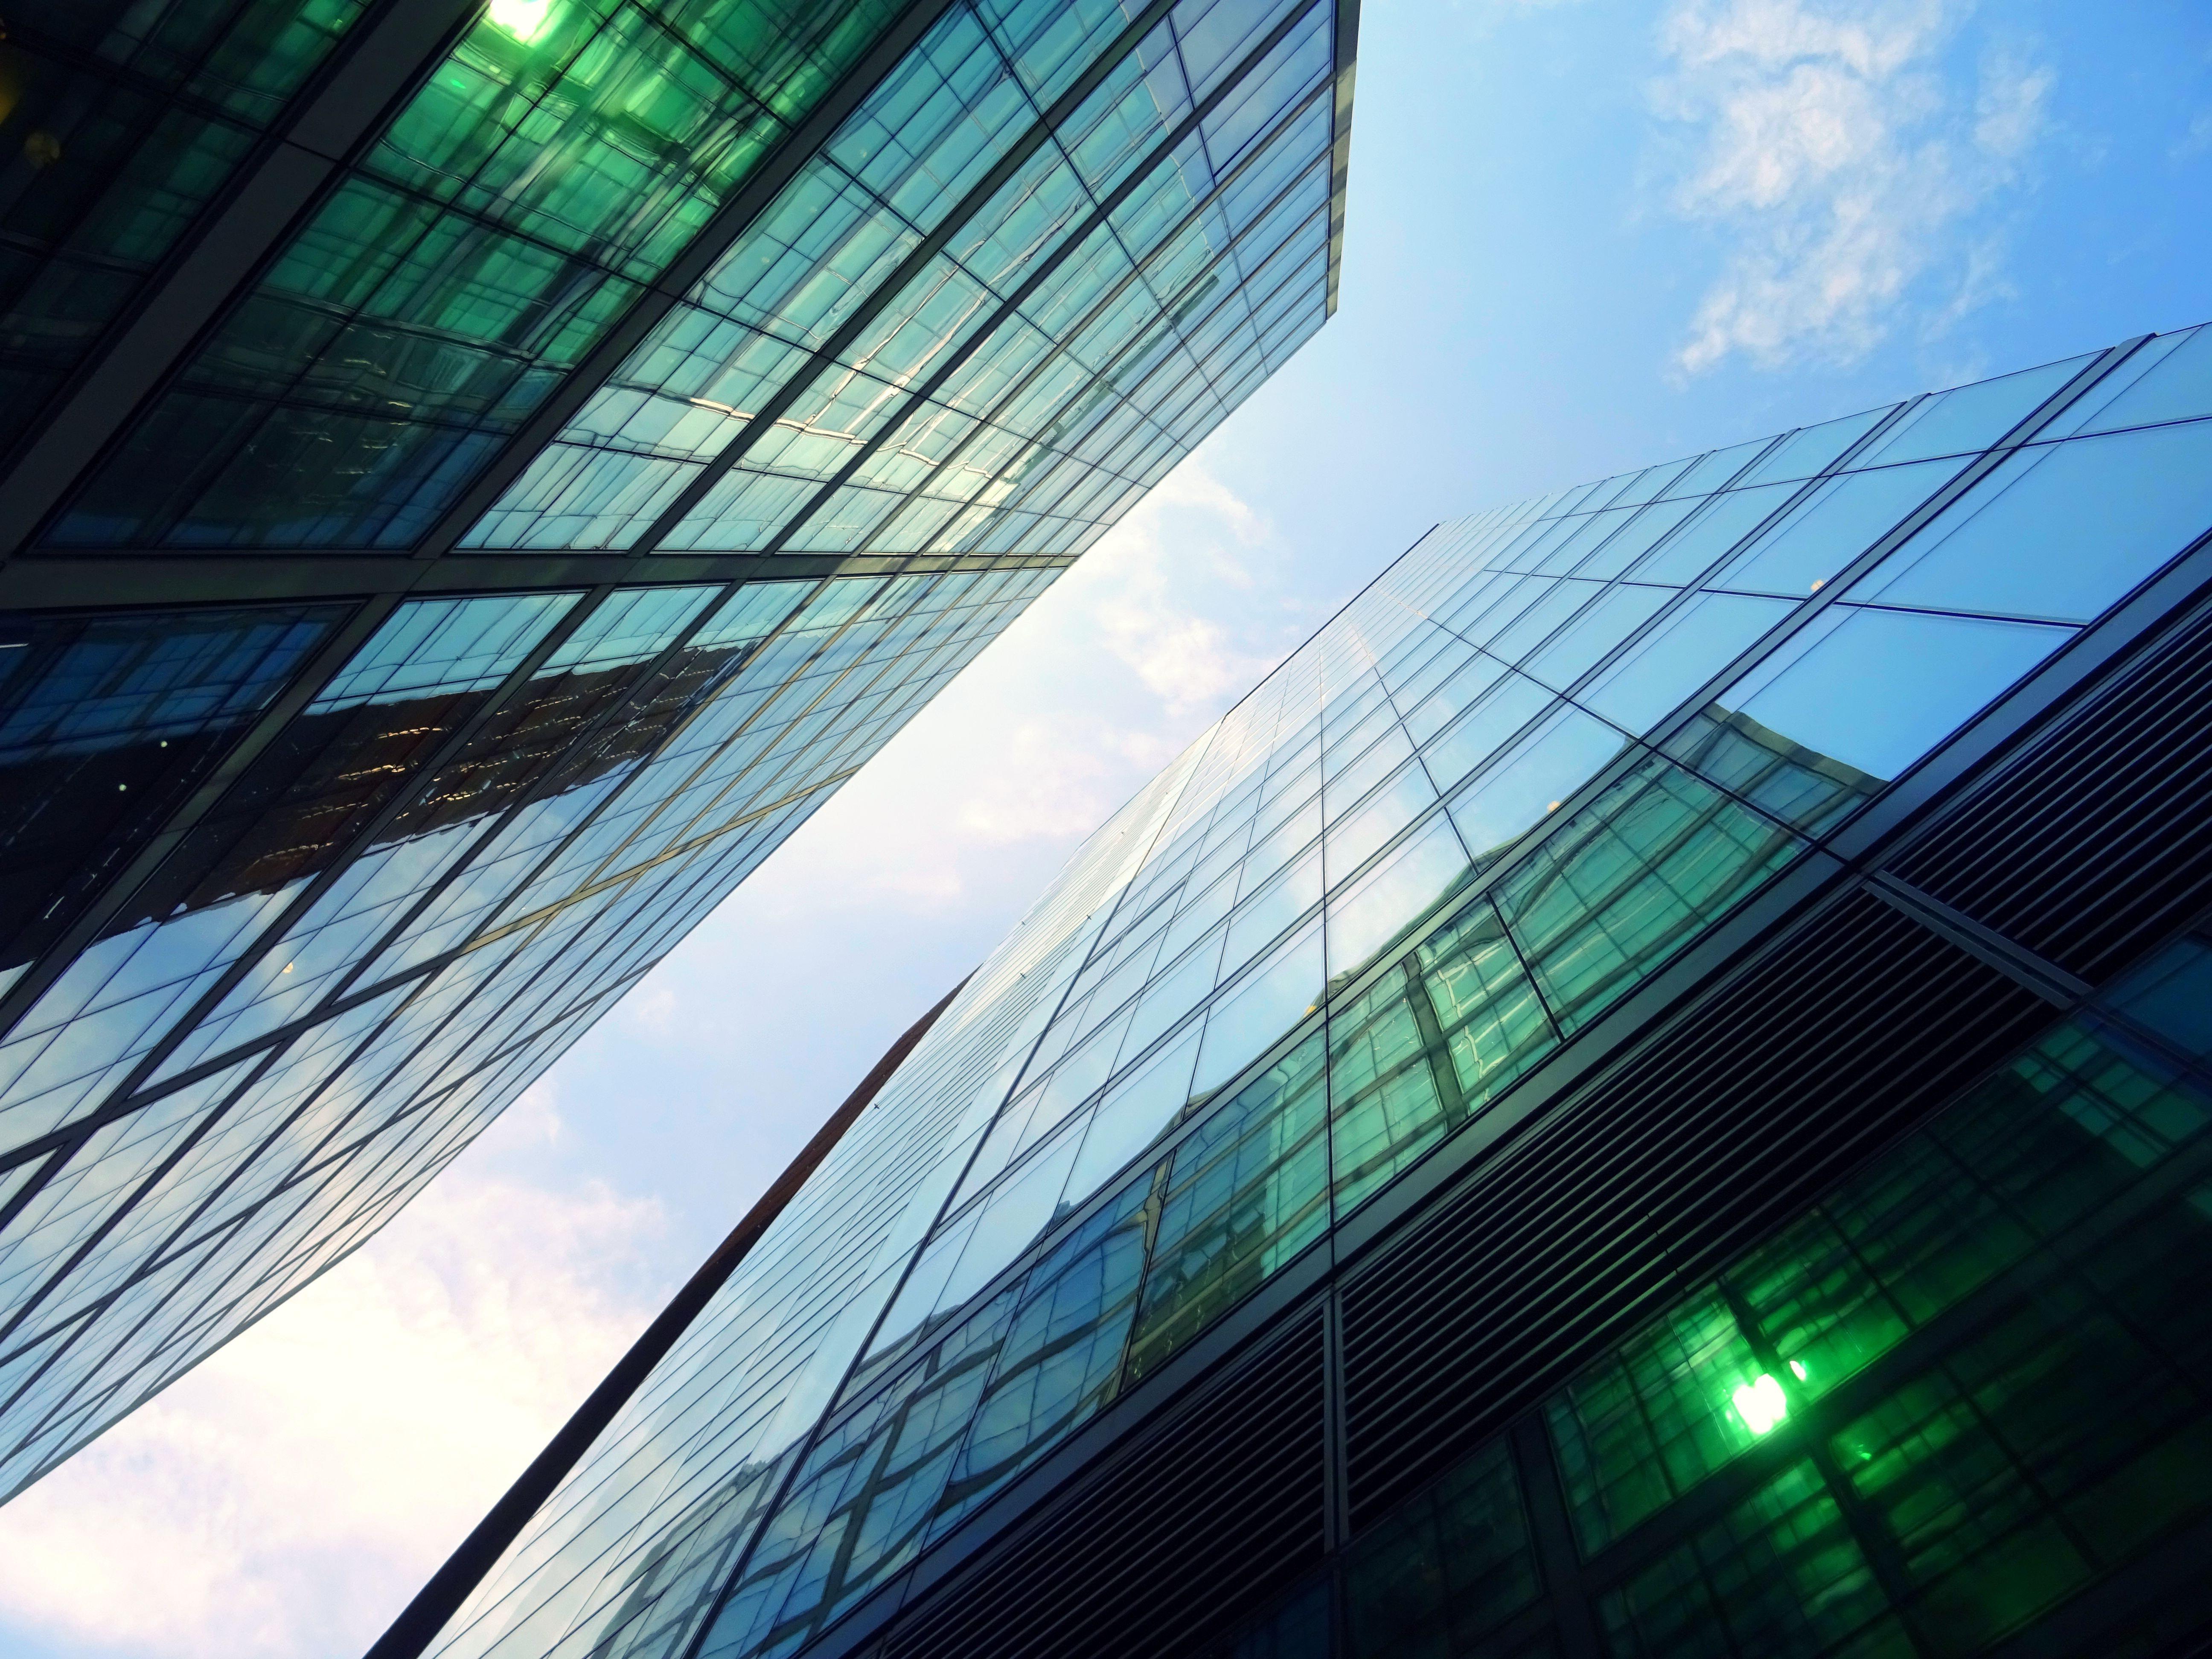 architectural-design-architecture-buildings-425010